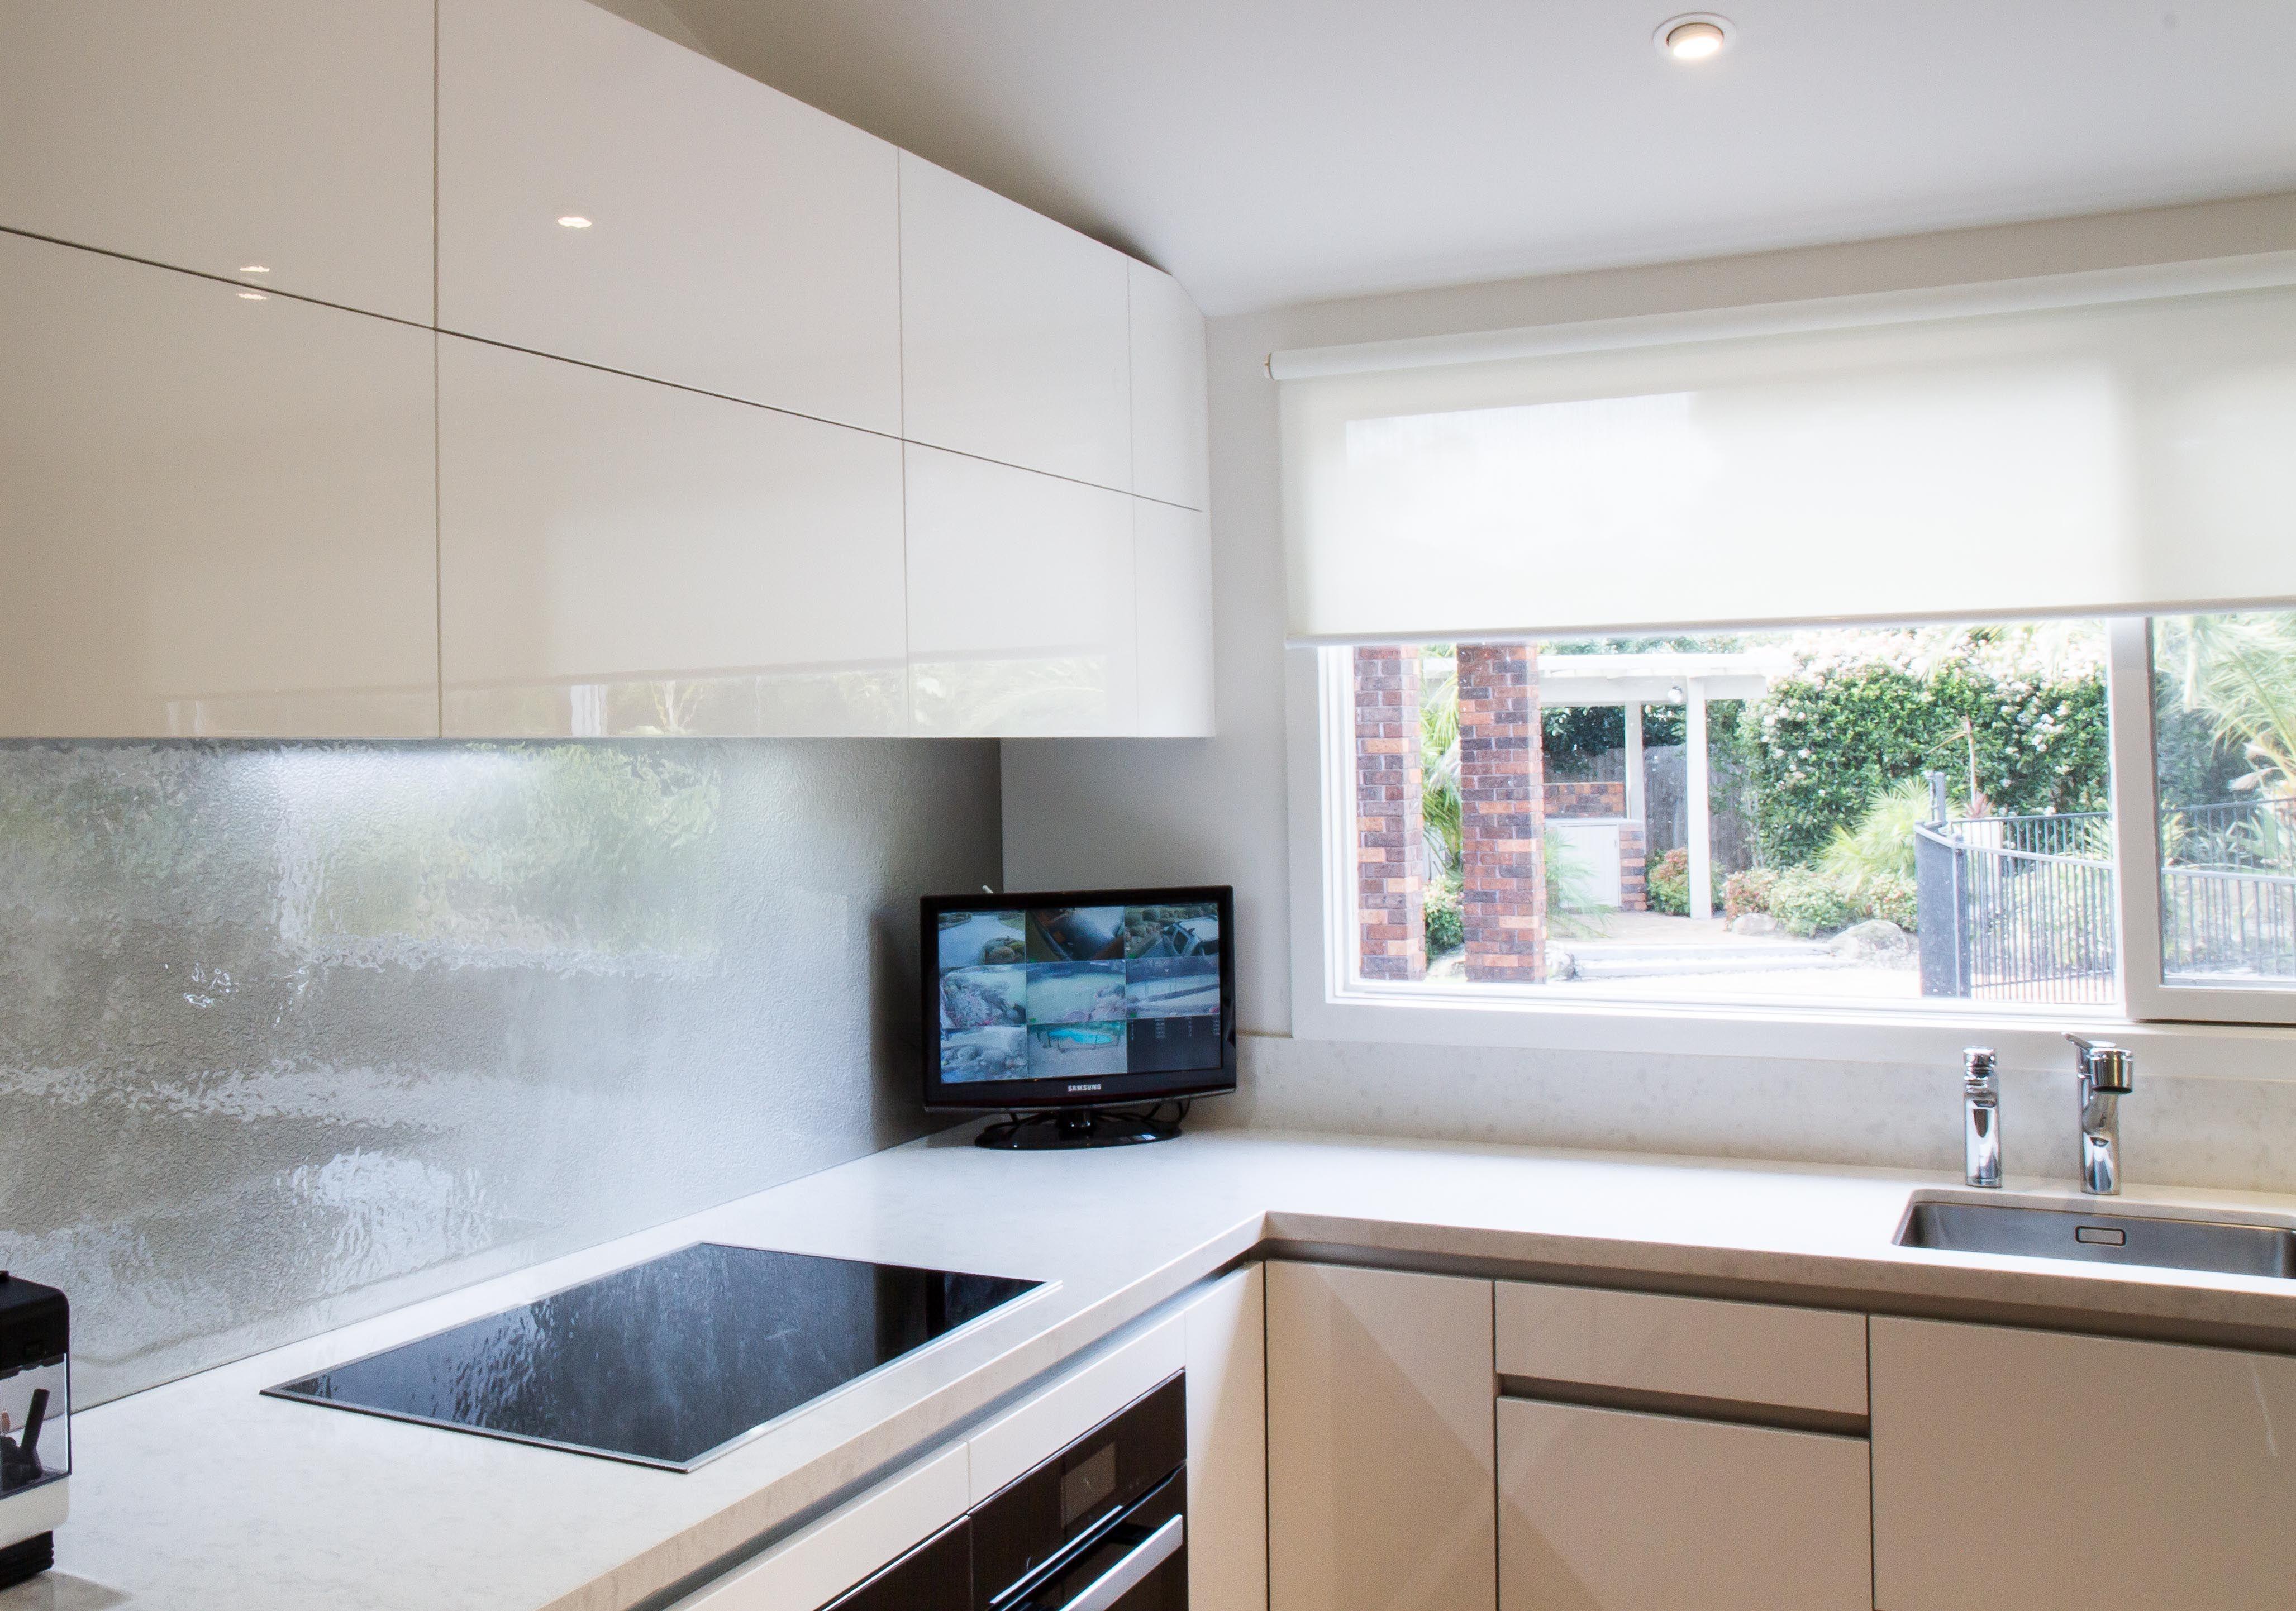 kitchens induction cooktop corner cabinet overhead cabinets no handles wwwthekitchendesigncentrecom. Interior Design Ideas. Home Design Ideas